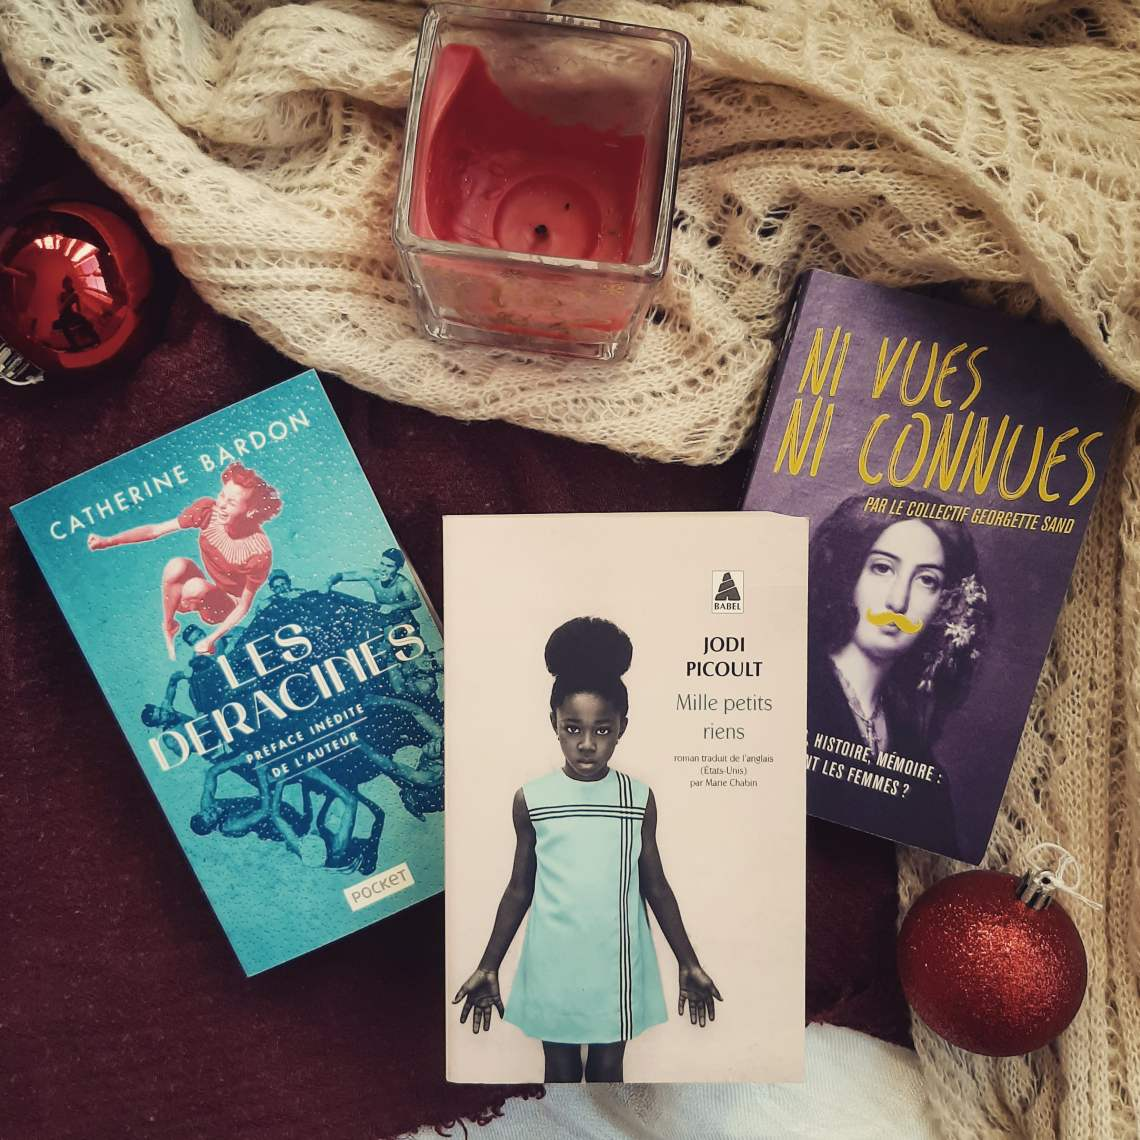 livres à offrir à Noël